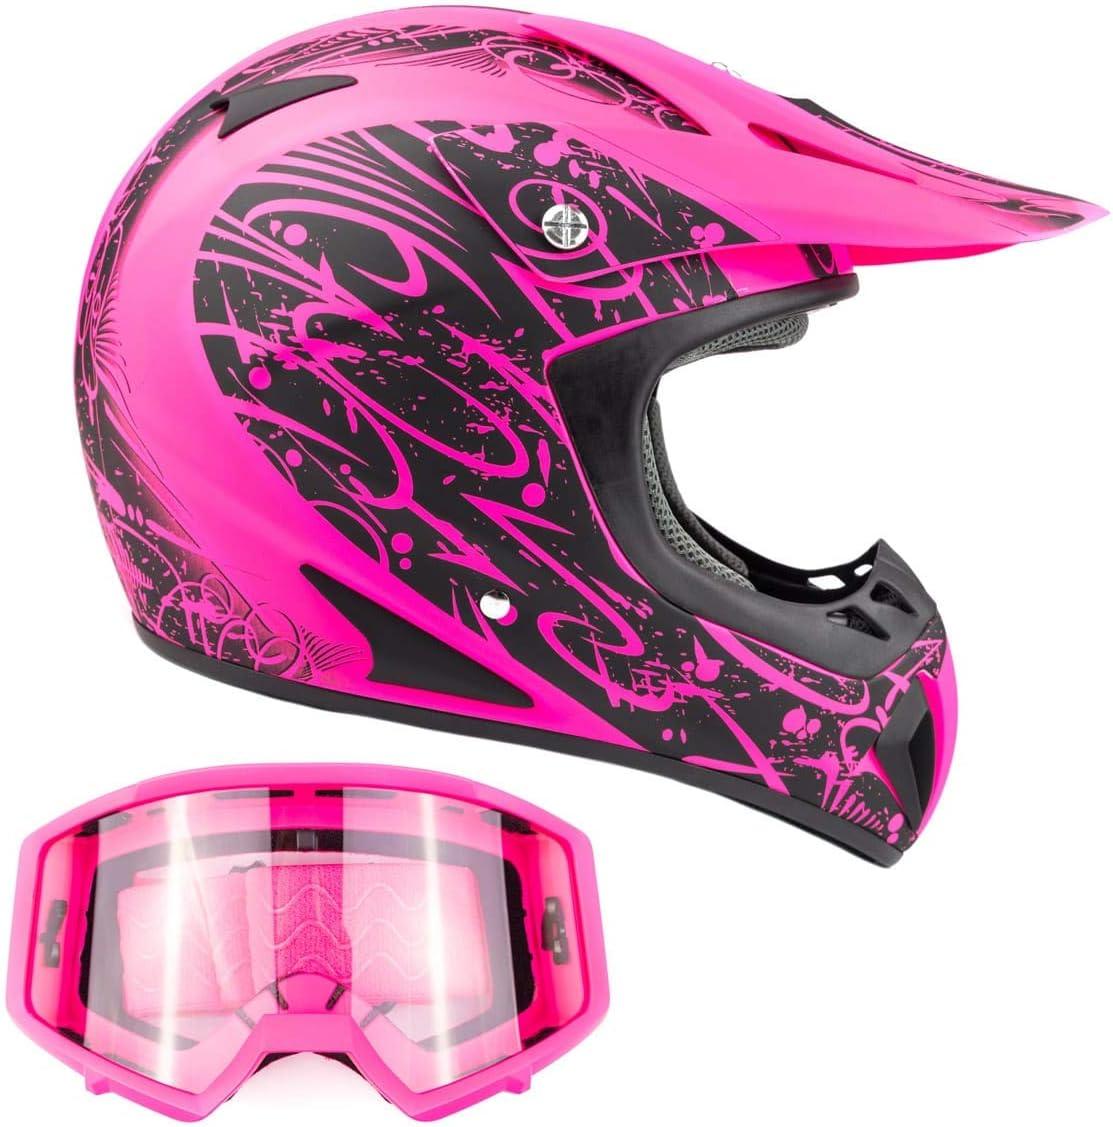 2018 Fox Racing V1 Race Helmet Adult MX Motocross Dirtbike ATV Offroad UTV